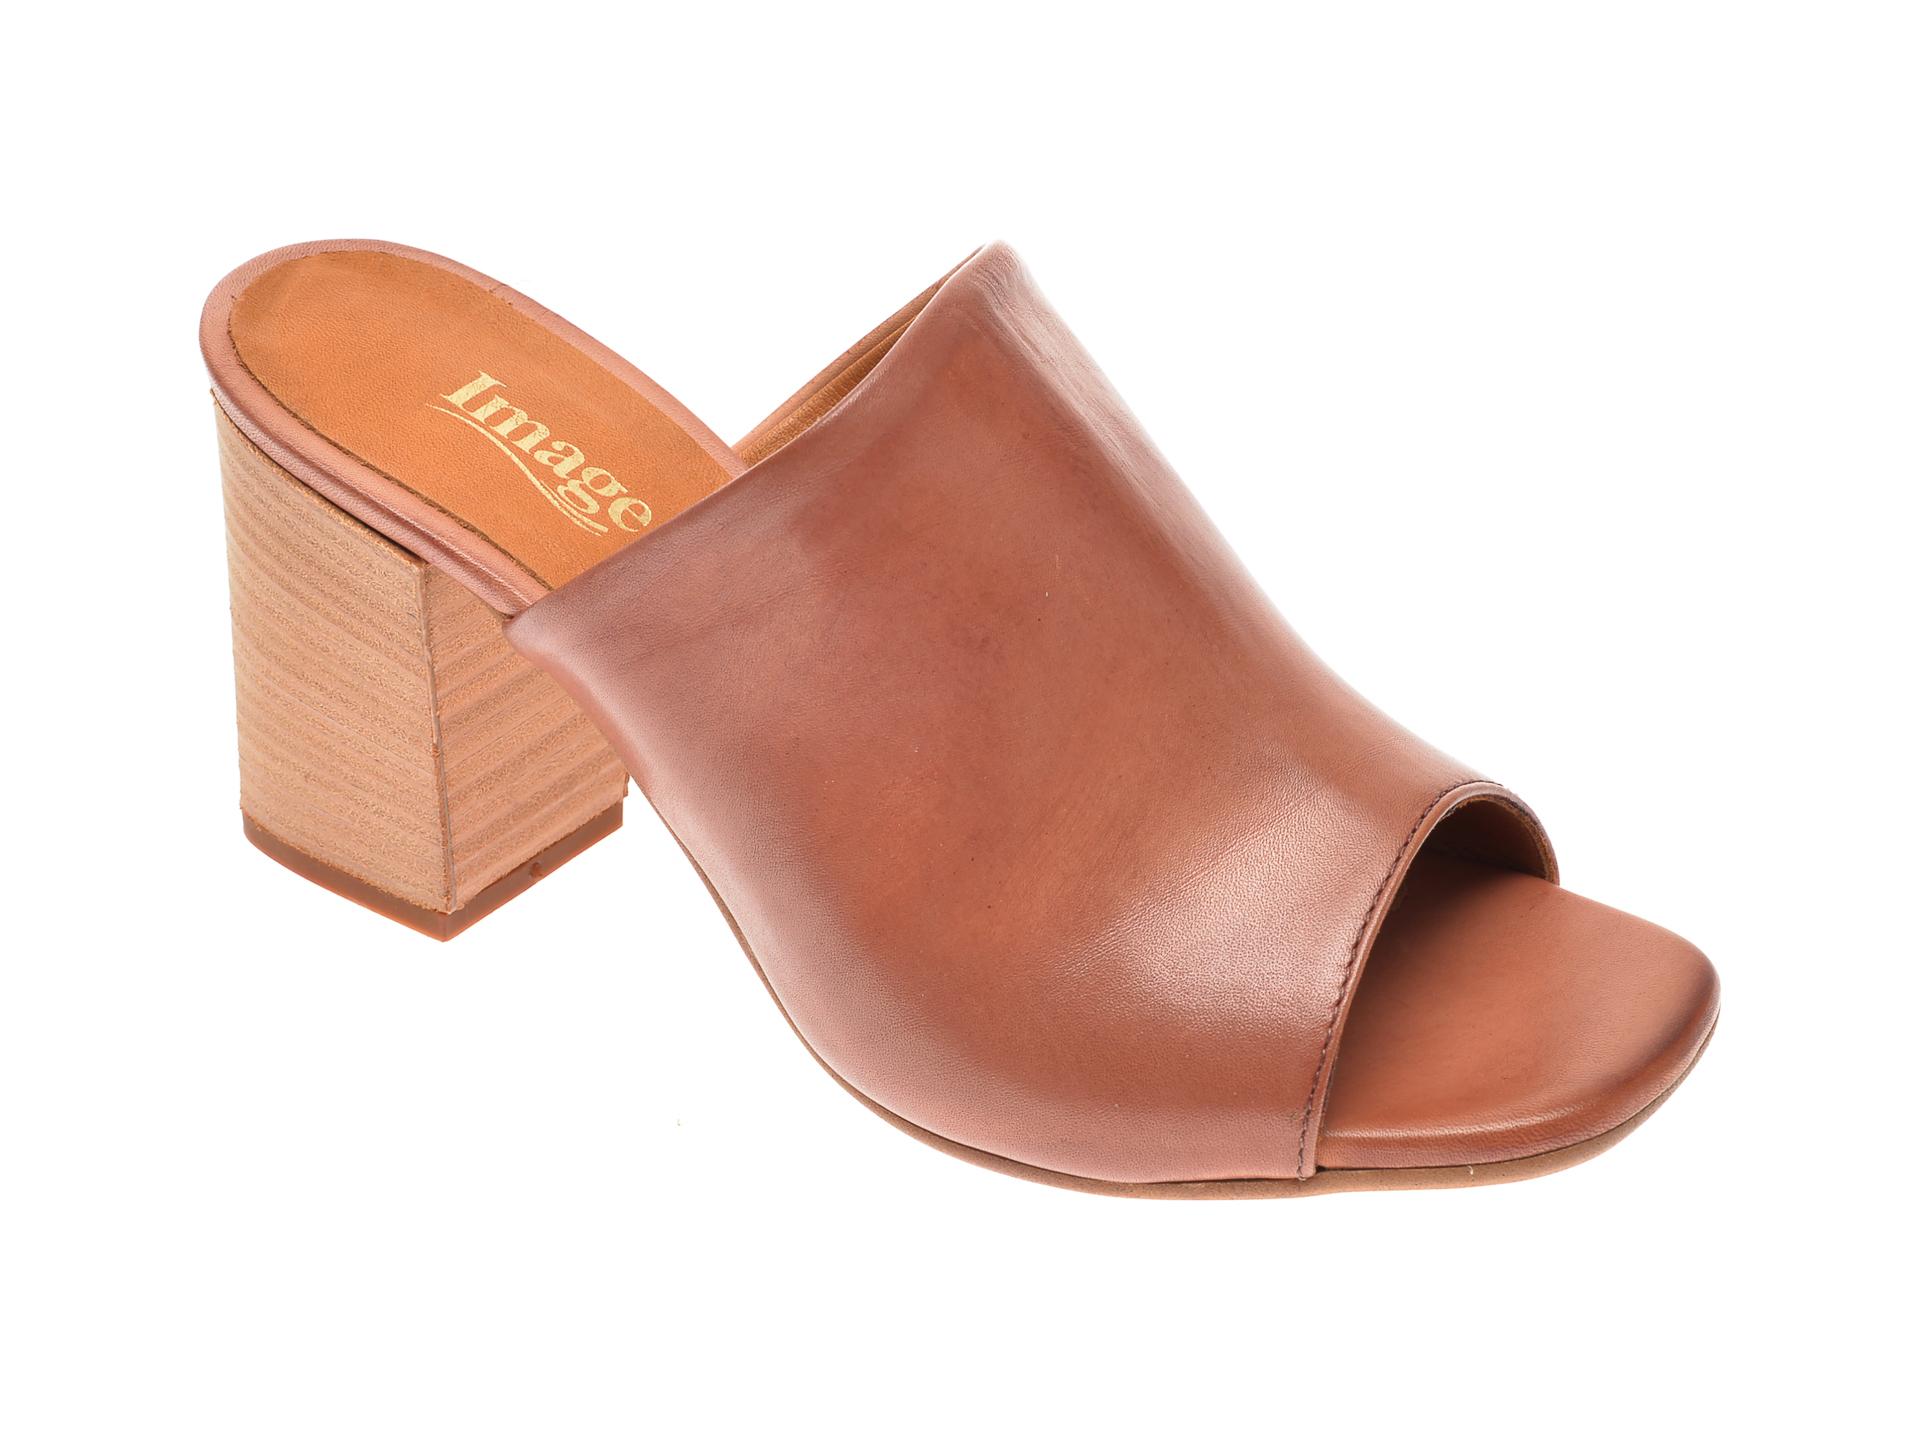 Papuci IMAGE maro, 4018, din piele naturala